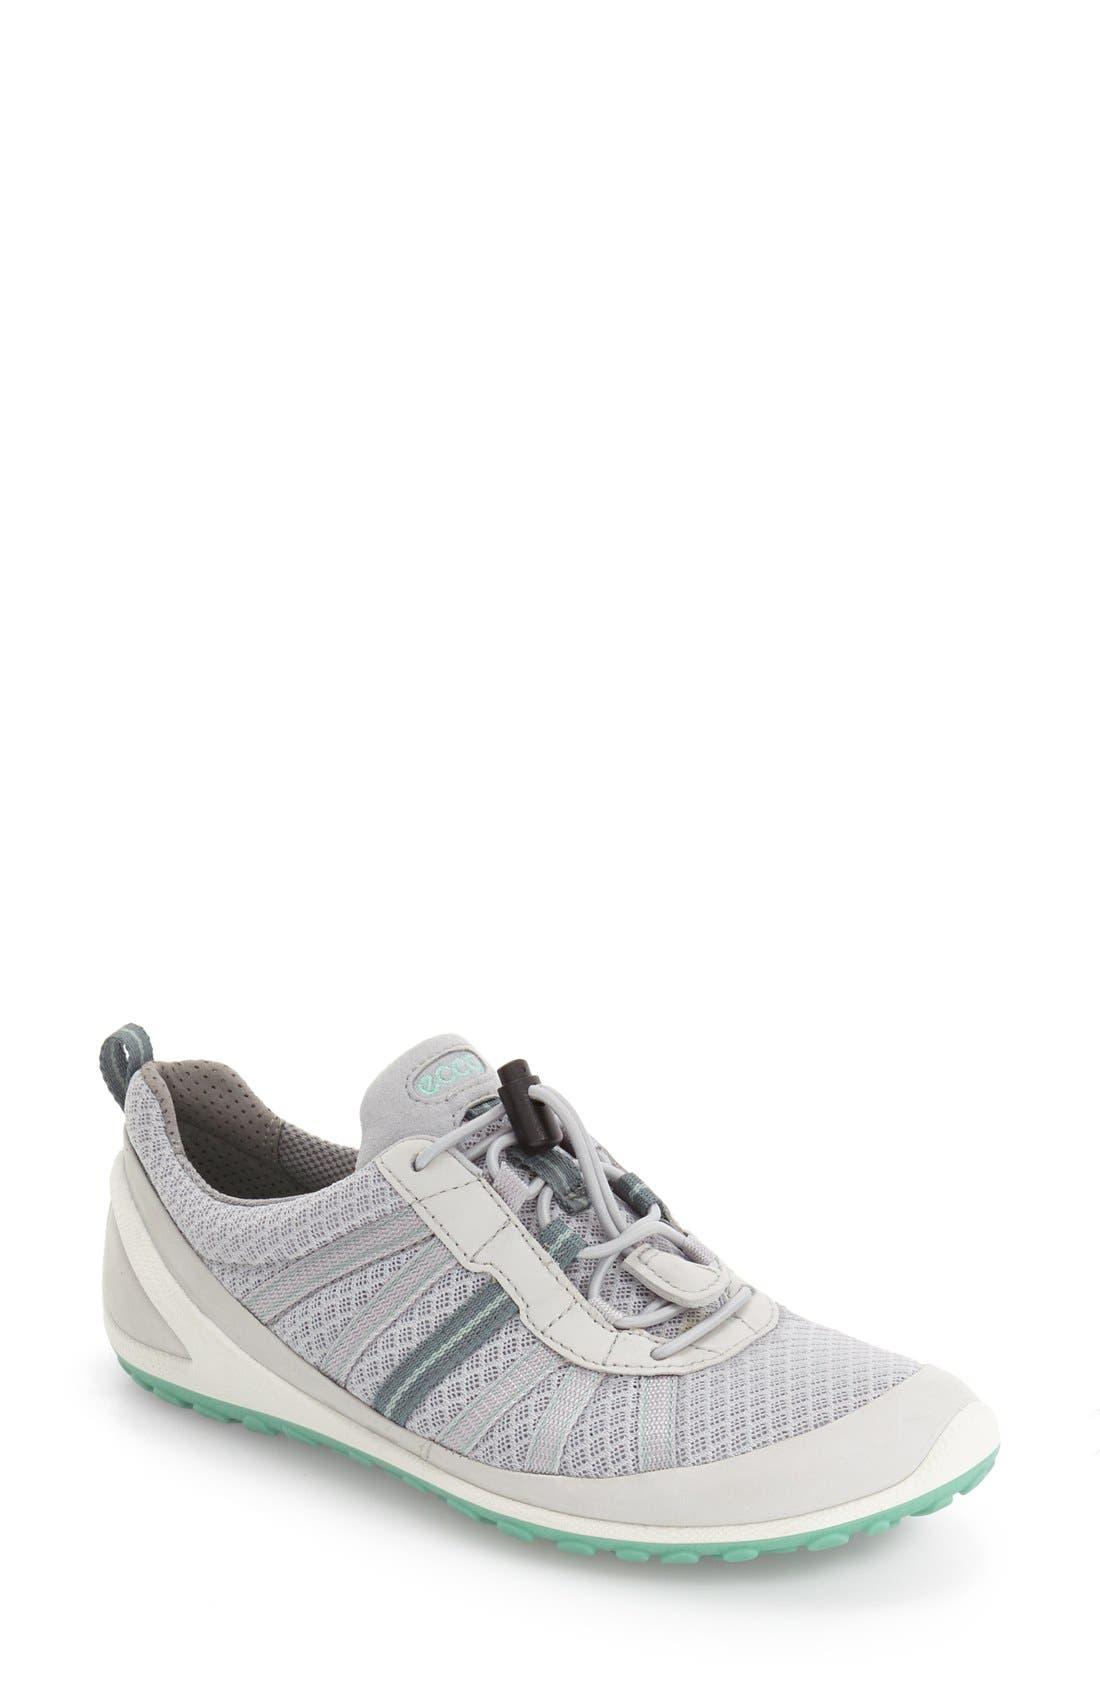 Main Image - ECCO 'Biom Lite' Sneaker (Women)